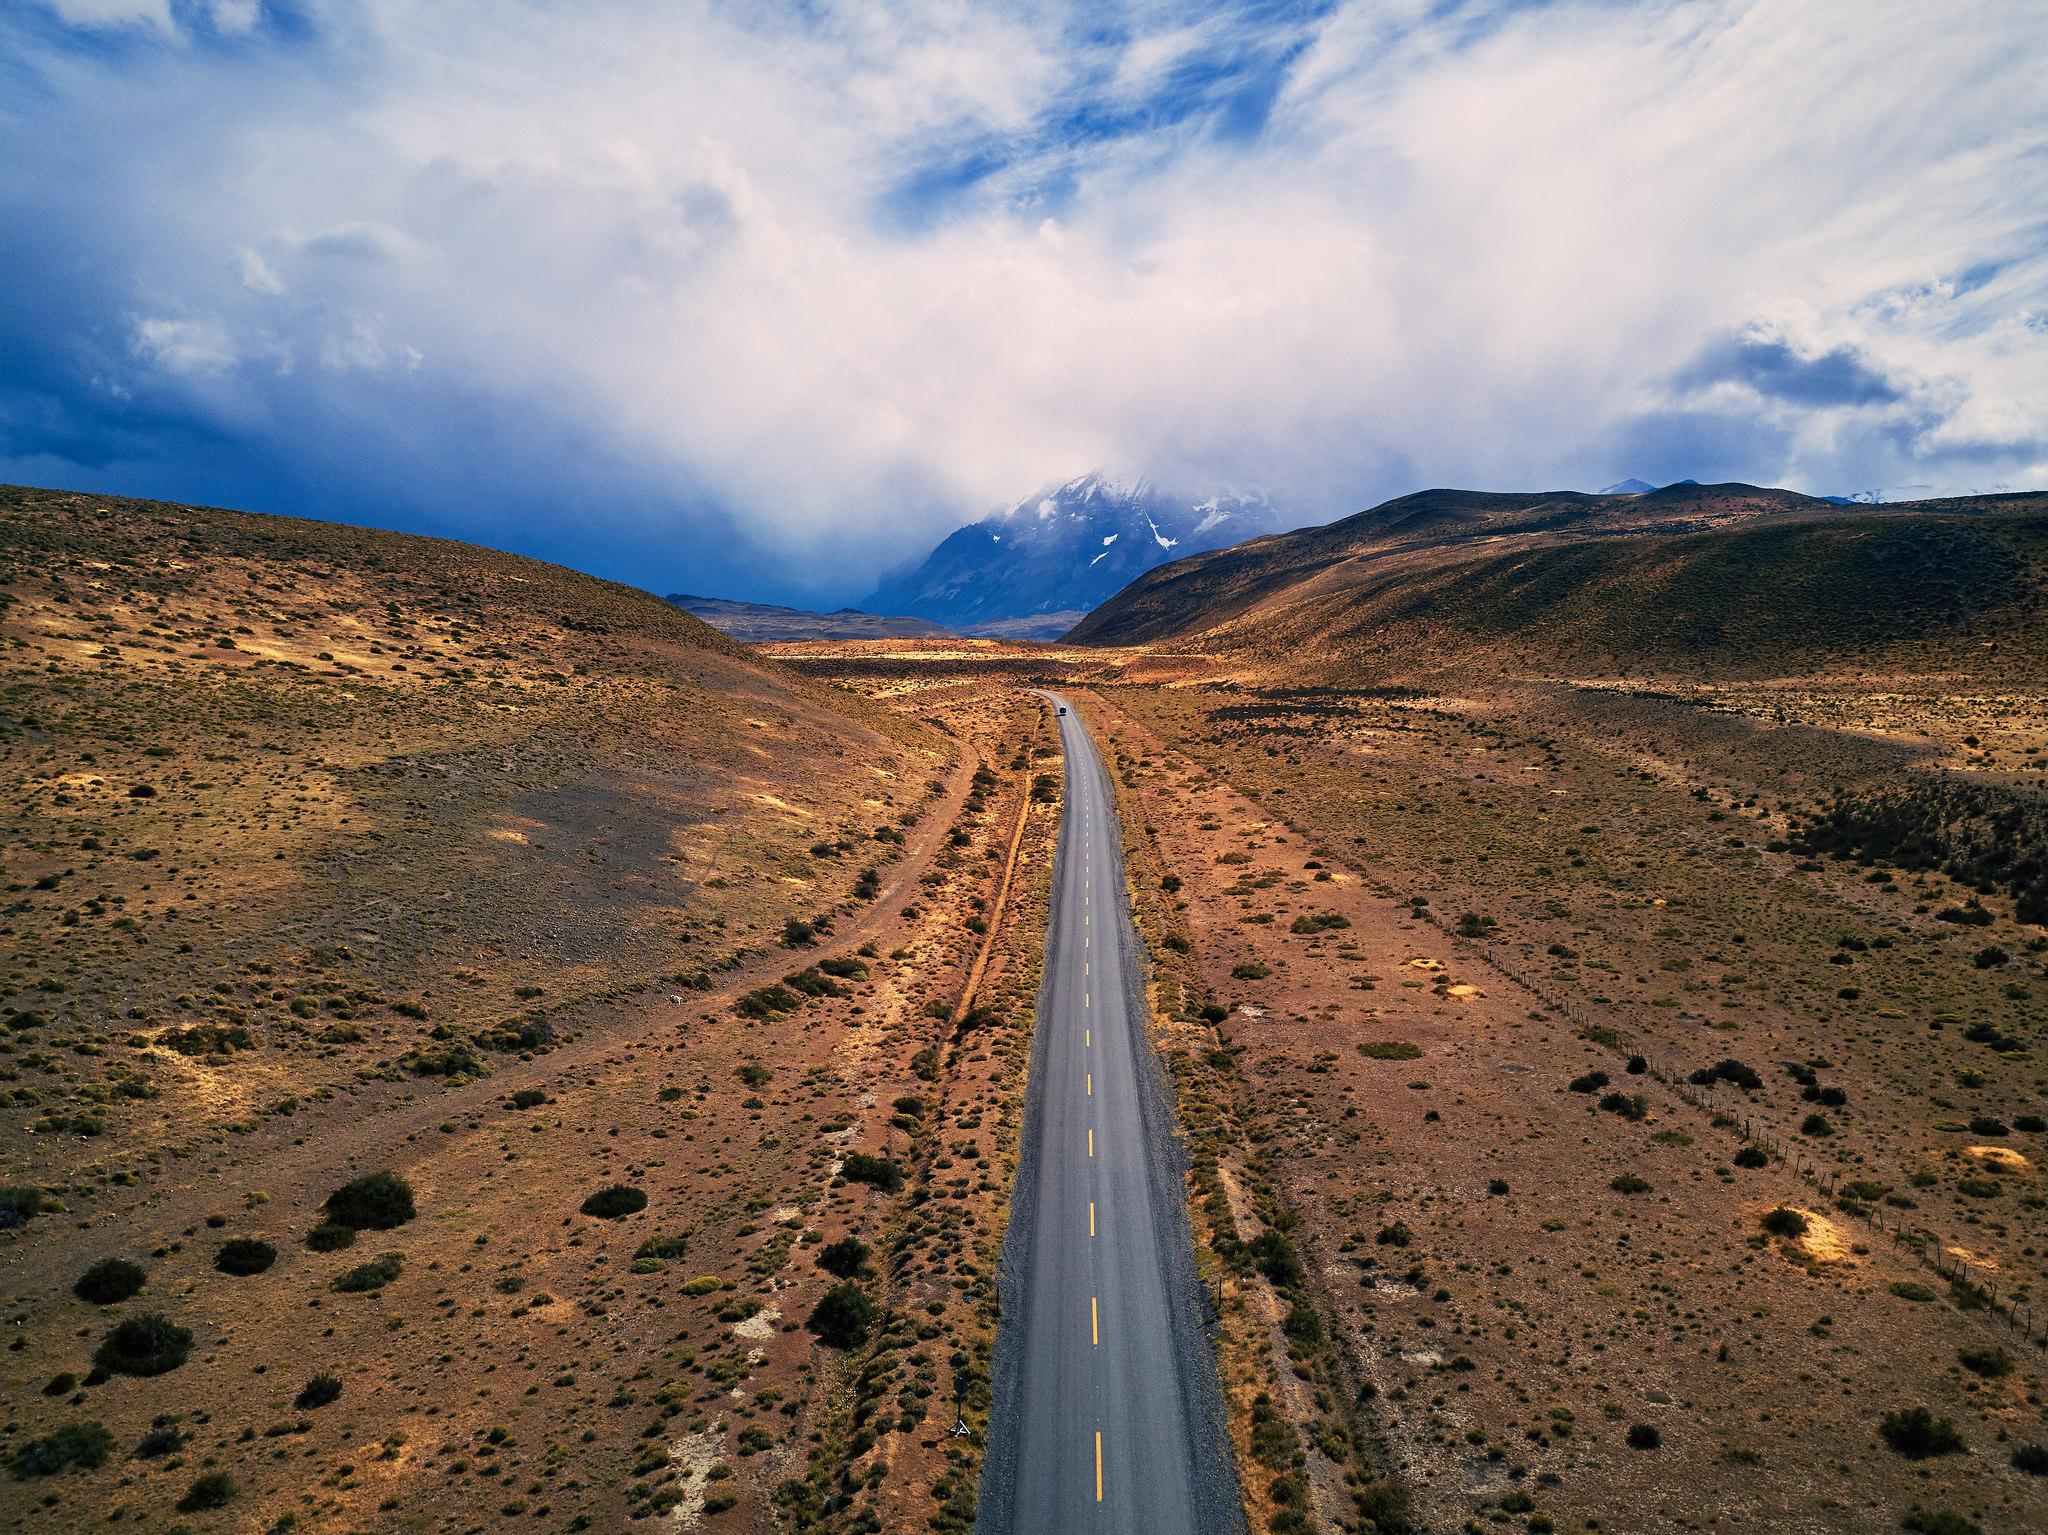 TEFL destinations for adventurers